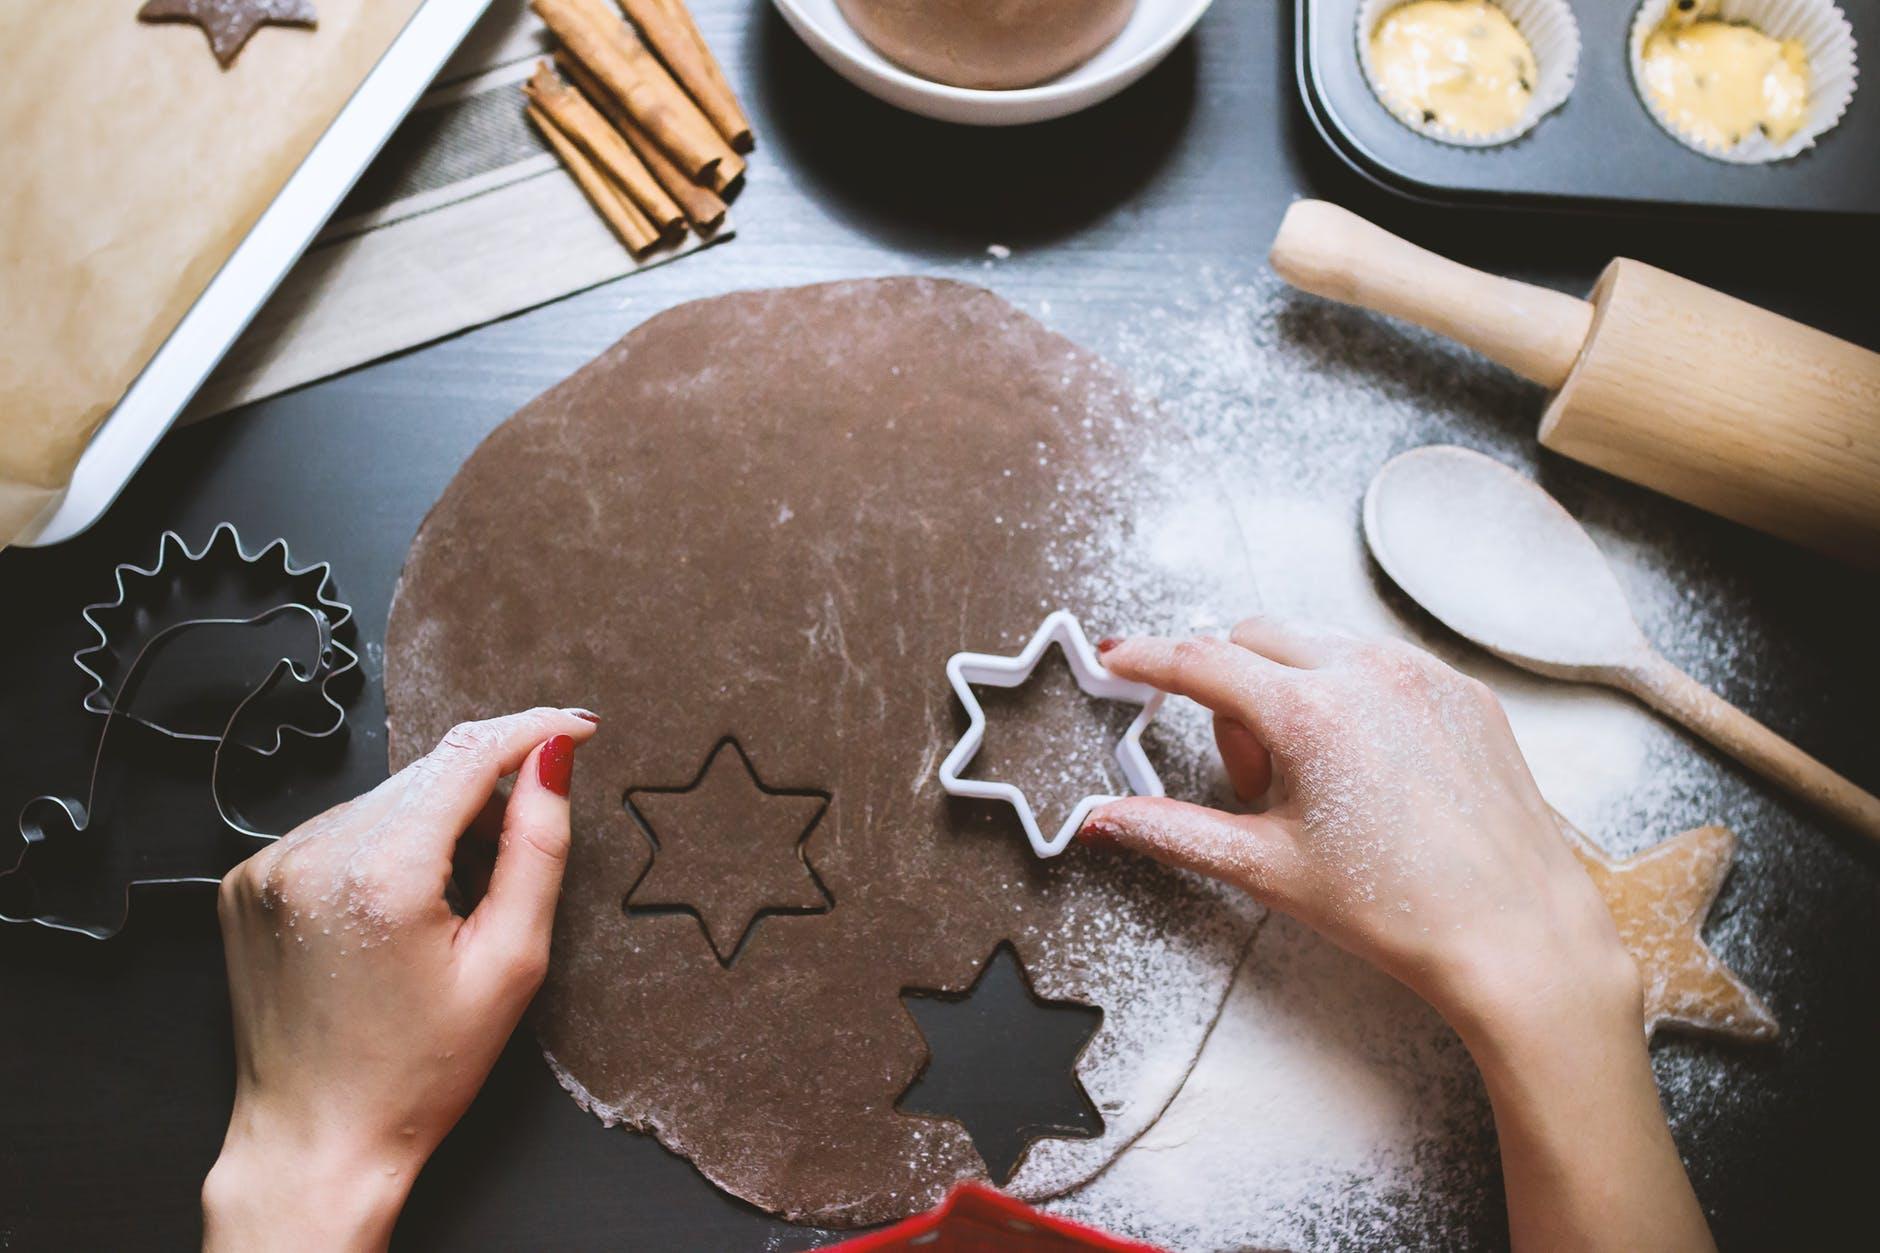 kolac kuhinja blagdan prejedanje secer